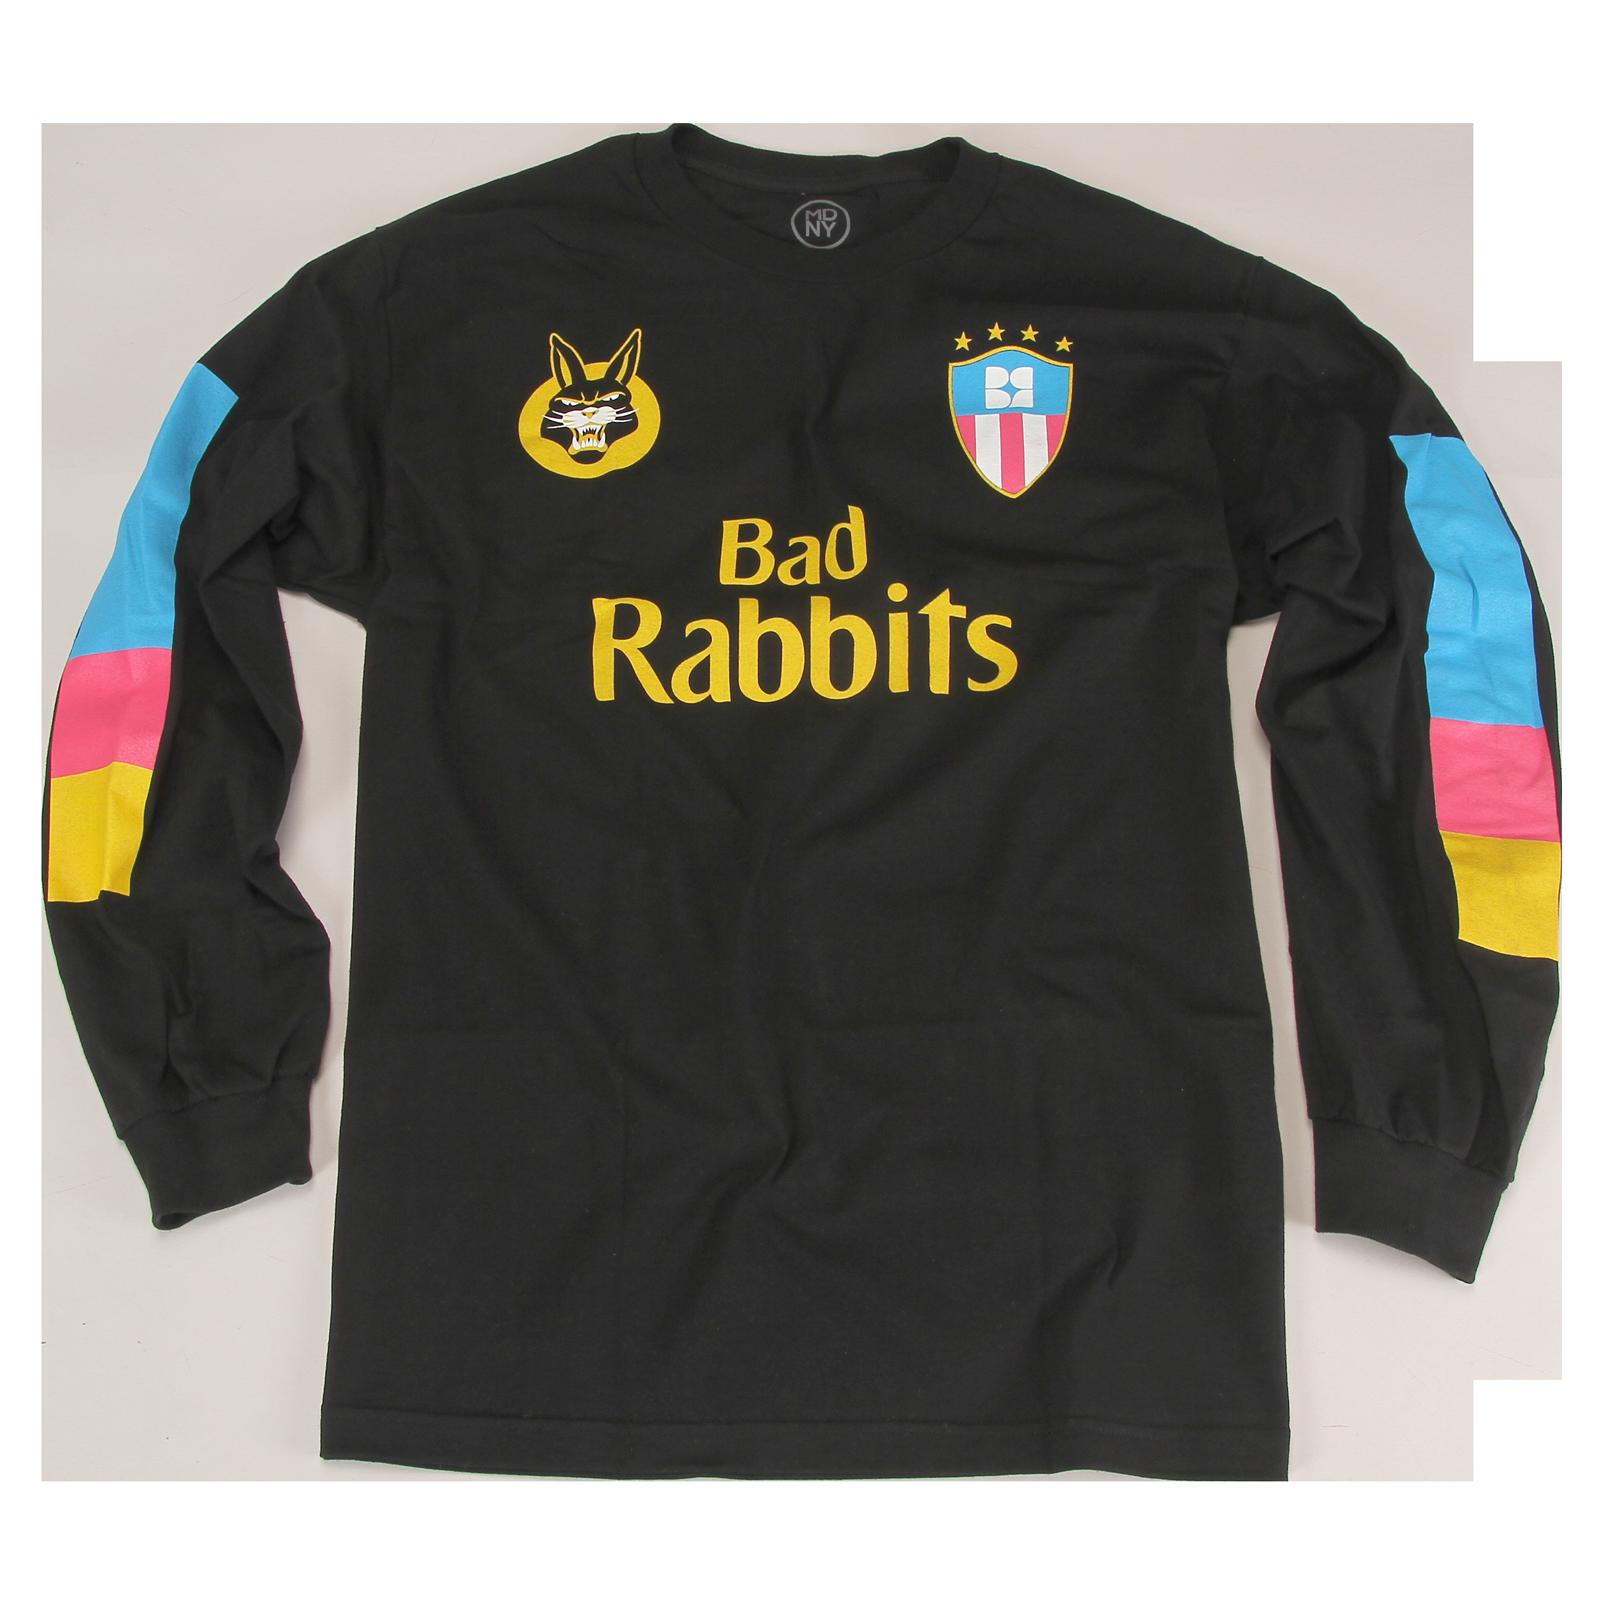 quality design cd6ab 1ed46 Mimi Soccer Jersey Black Long Sleeve - Bad Rabbits